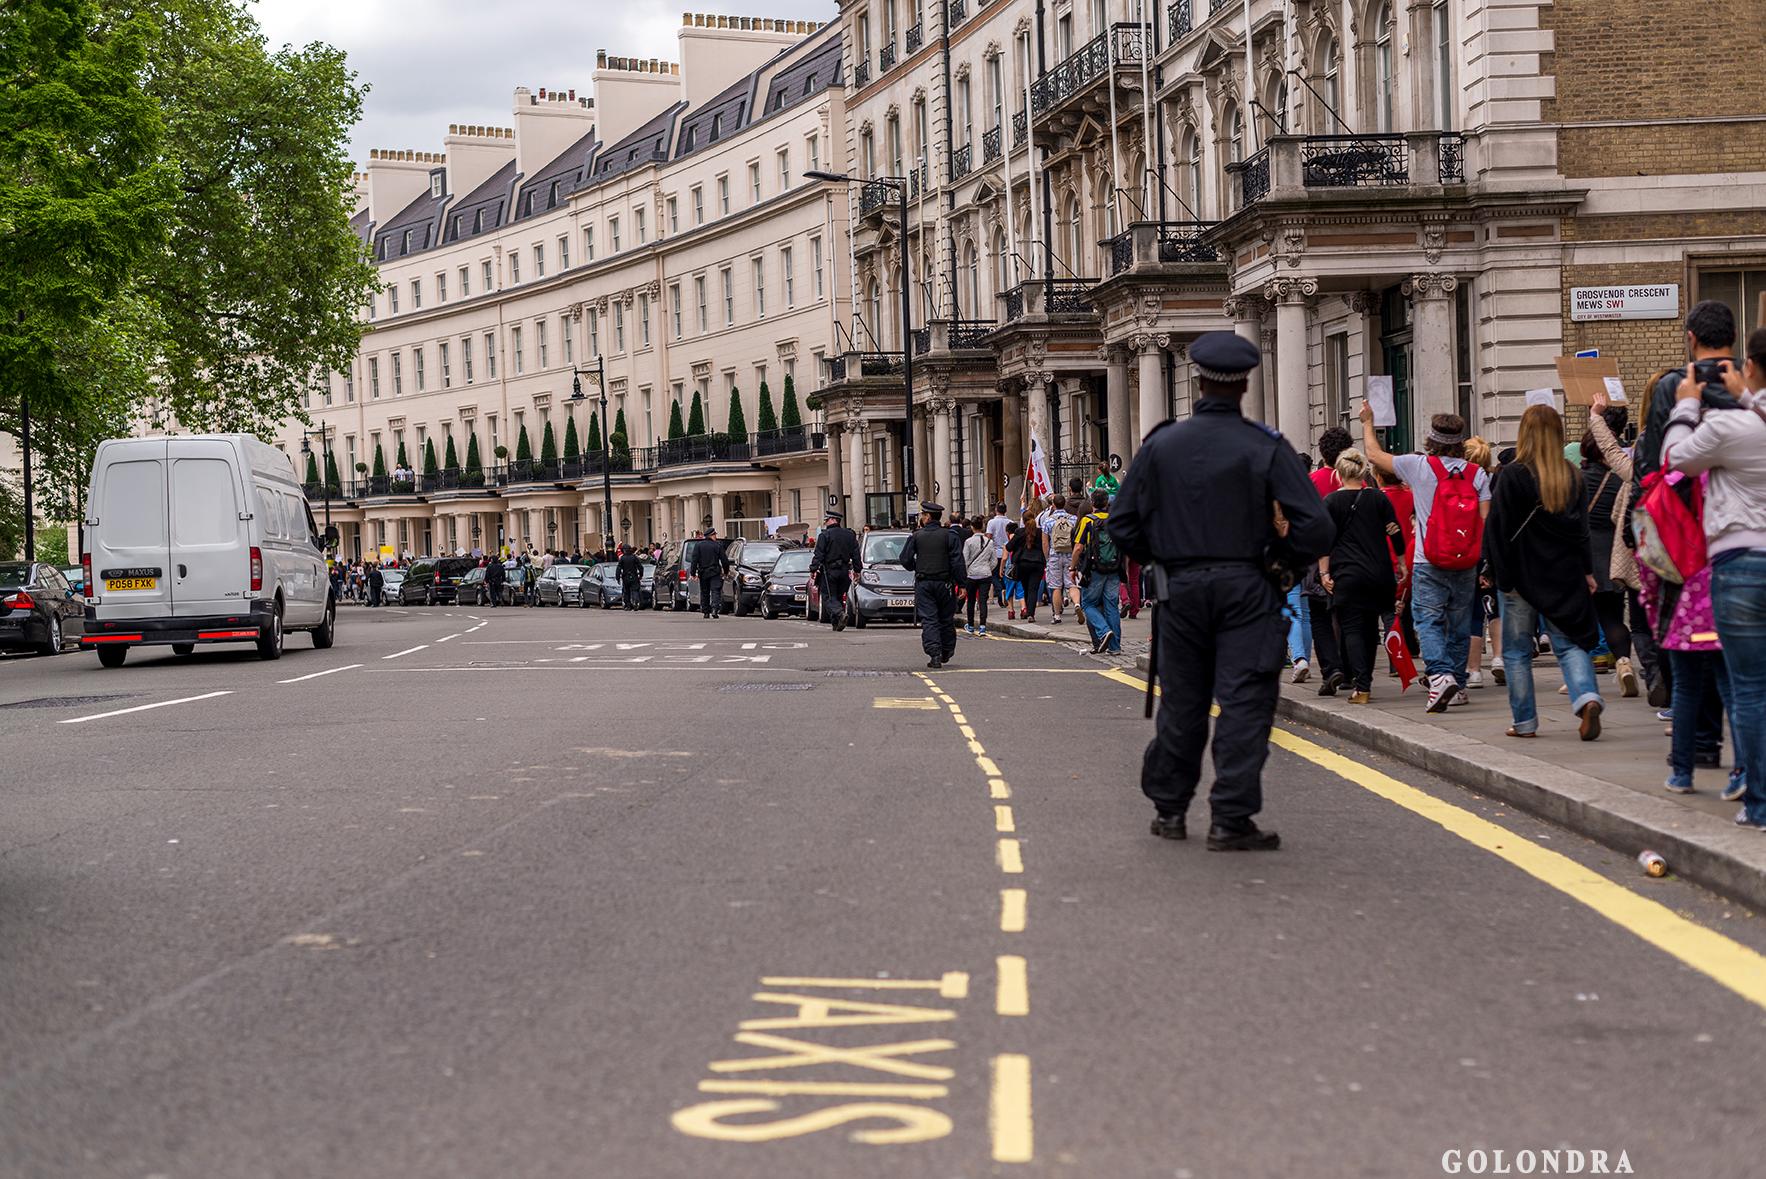 Protesting Turkish Government - Turk Hukumetini Protesto - Londra - London (37)